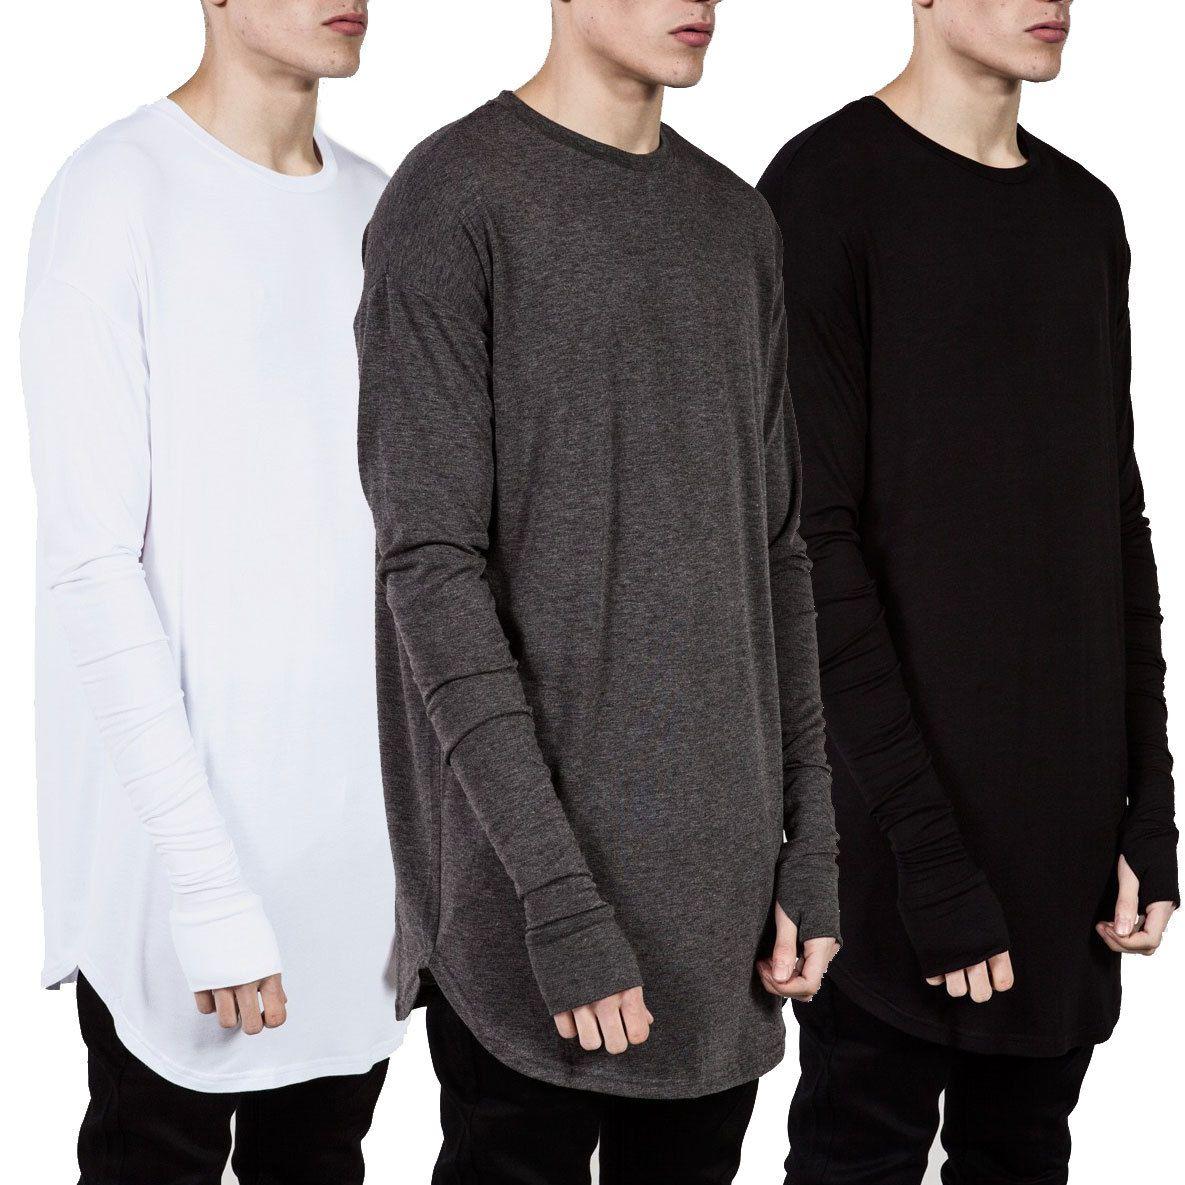 2019 New Trends Men T shirts Super Longline Long Sleeve T-Shirt Hip Hop Arc hem With Curve Hem Side Zip Tops tee